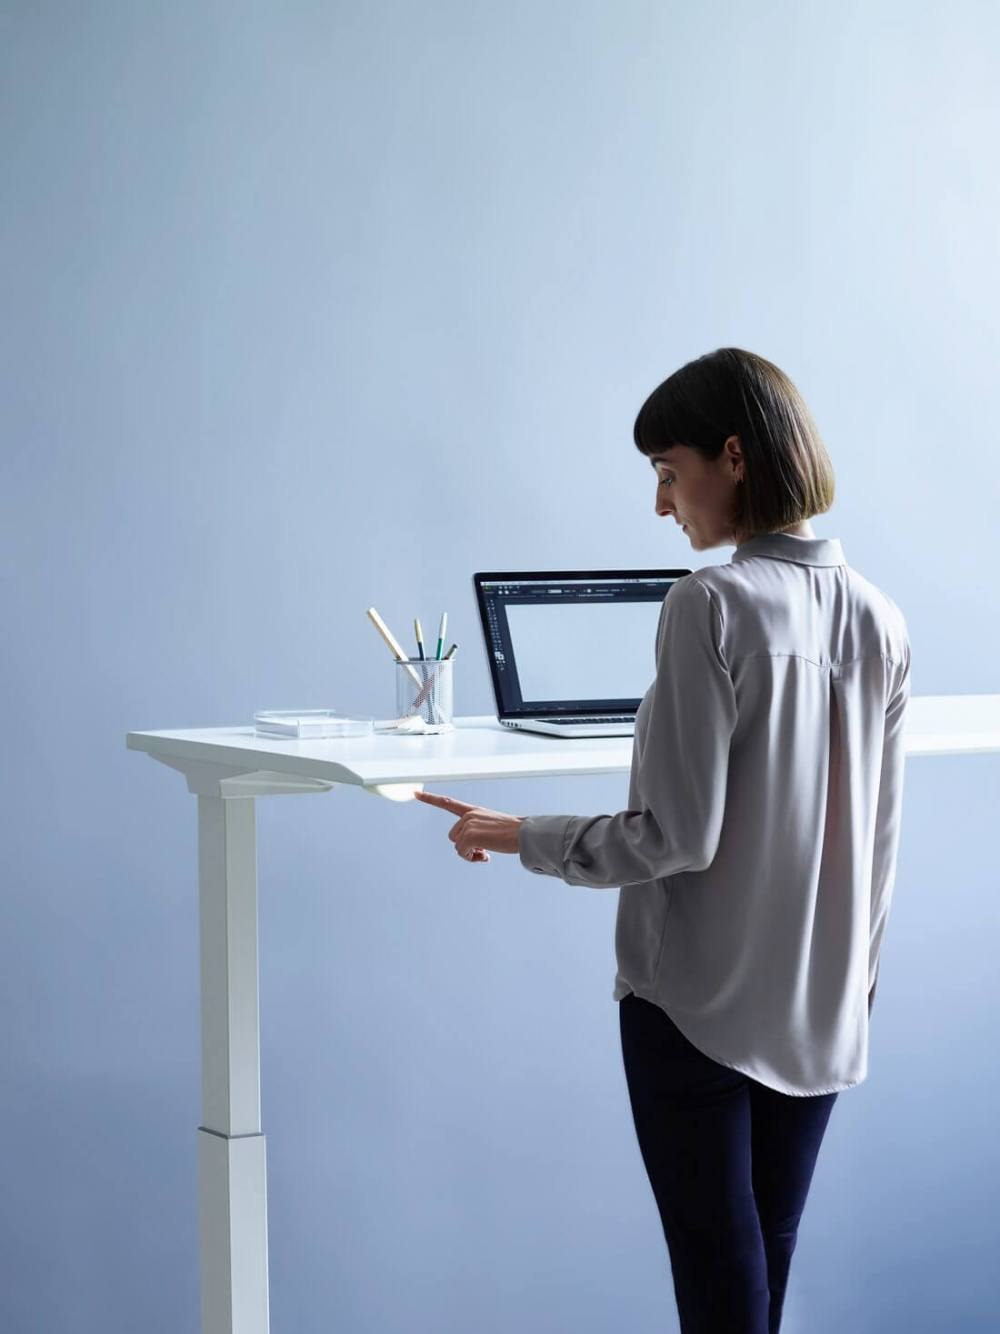 Live OS une mesas e humanos através da tecnologia